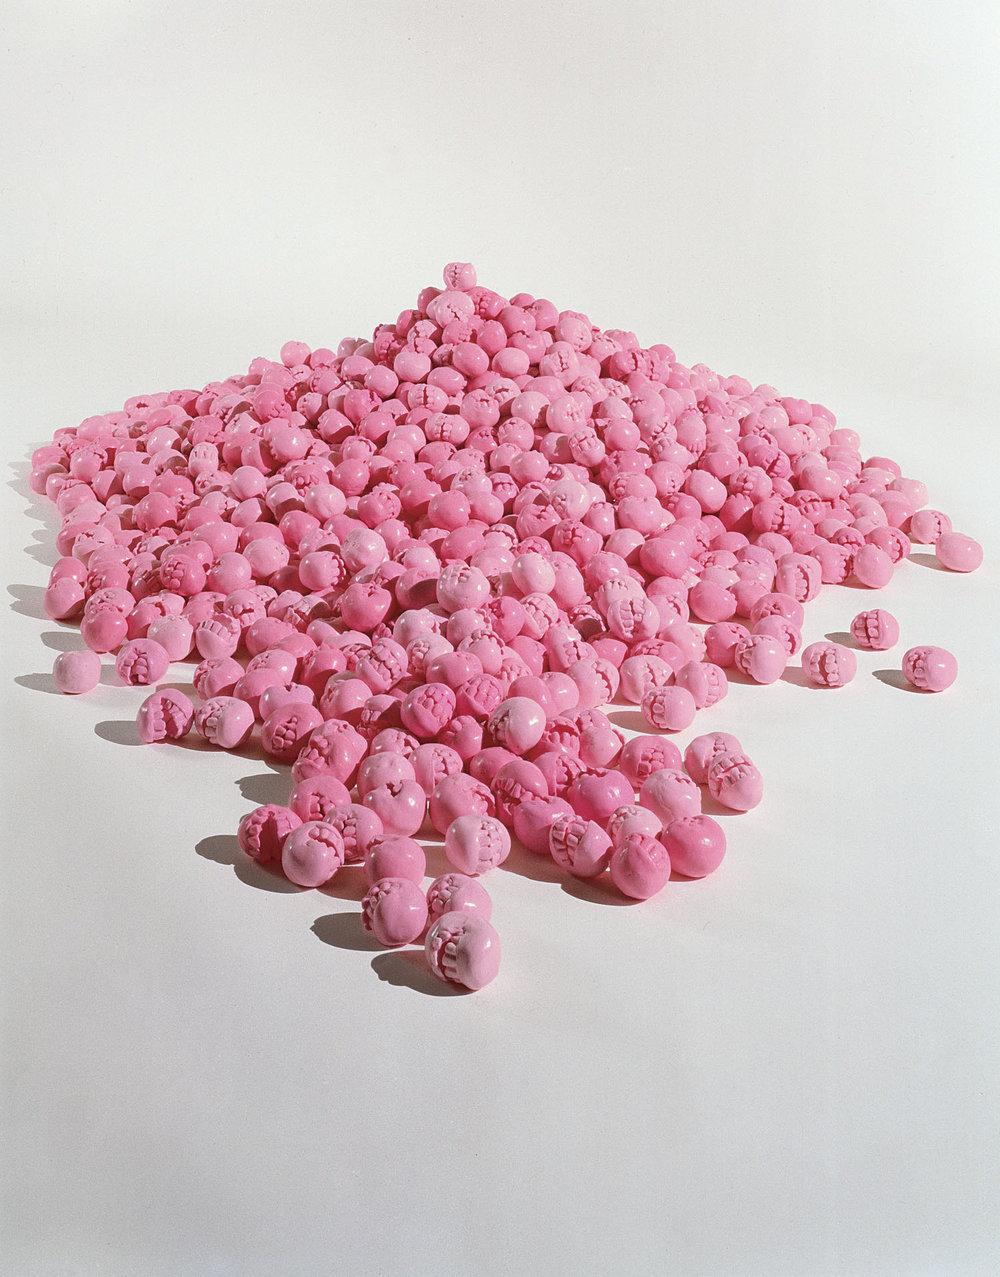 Pink Treats